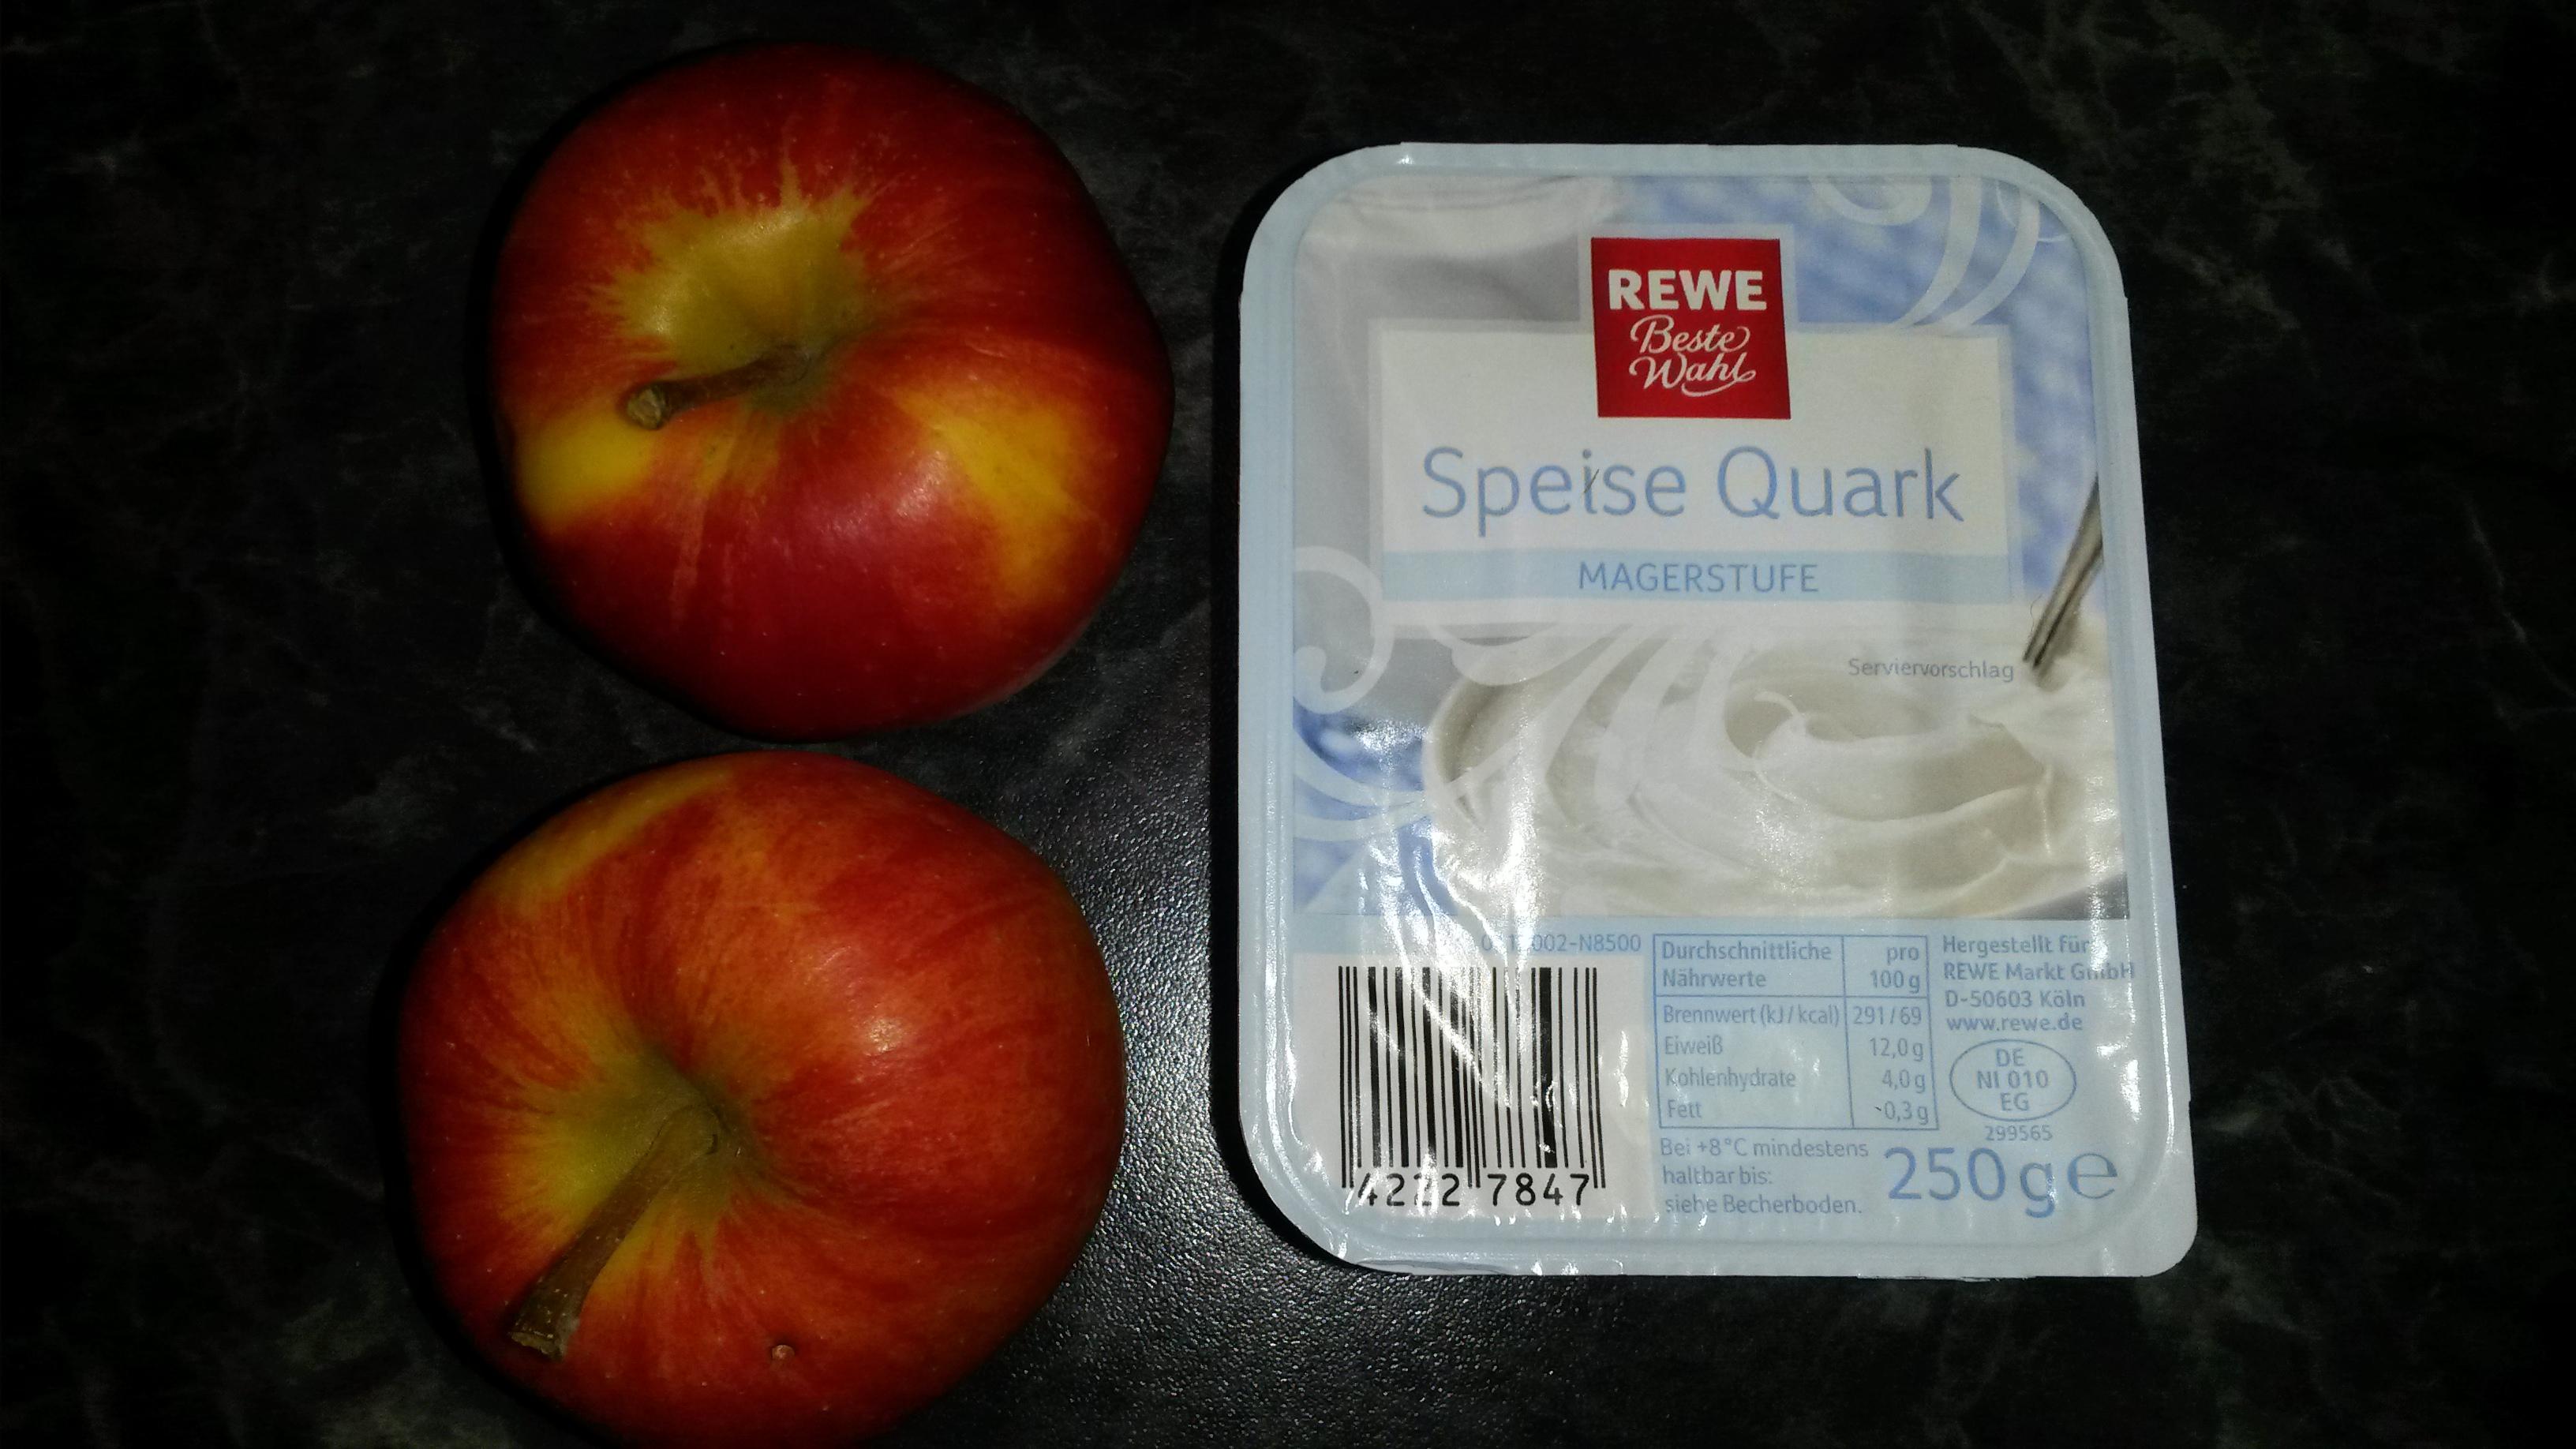 https://foodloader.net/sk0r_2014-02-16_Magerquark_und_Aepfel.jpg